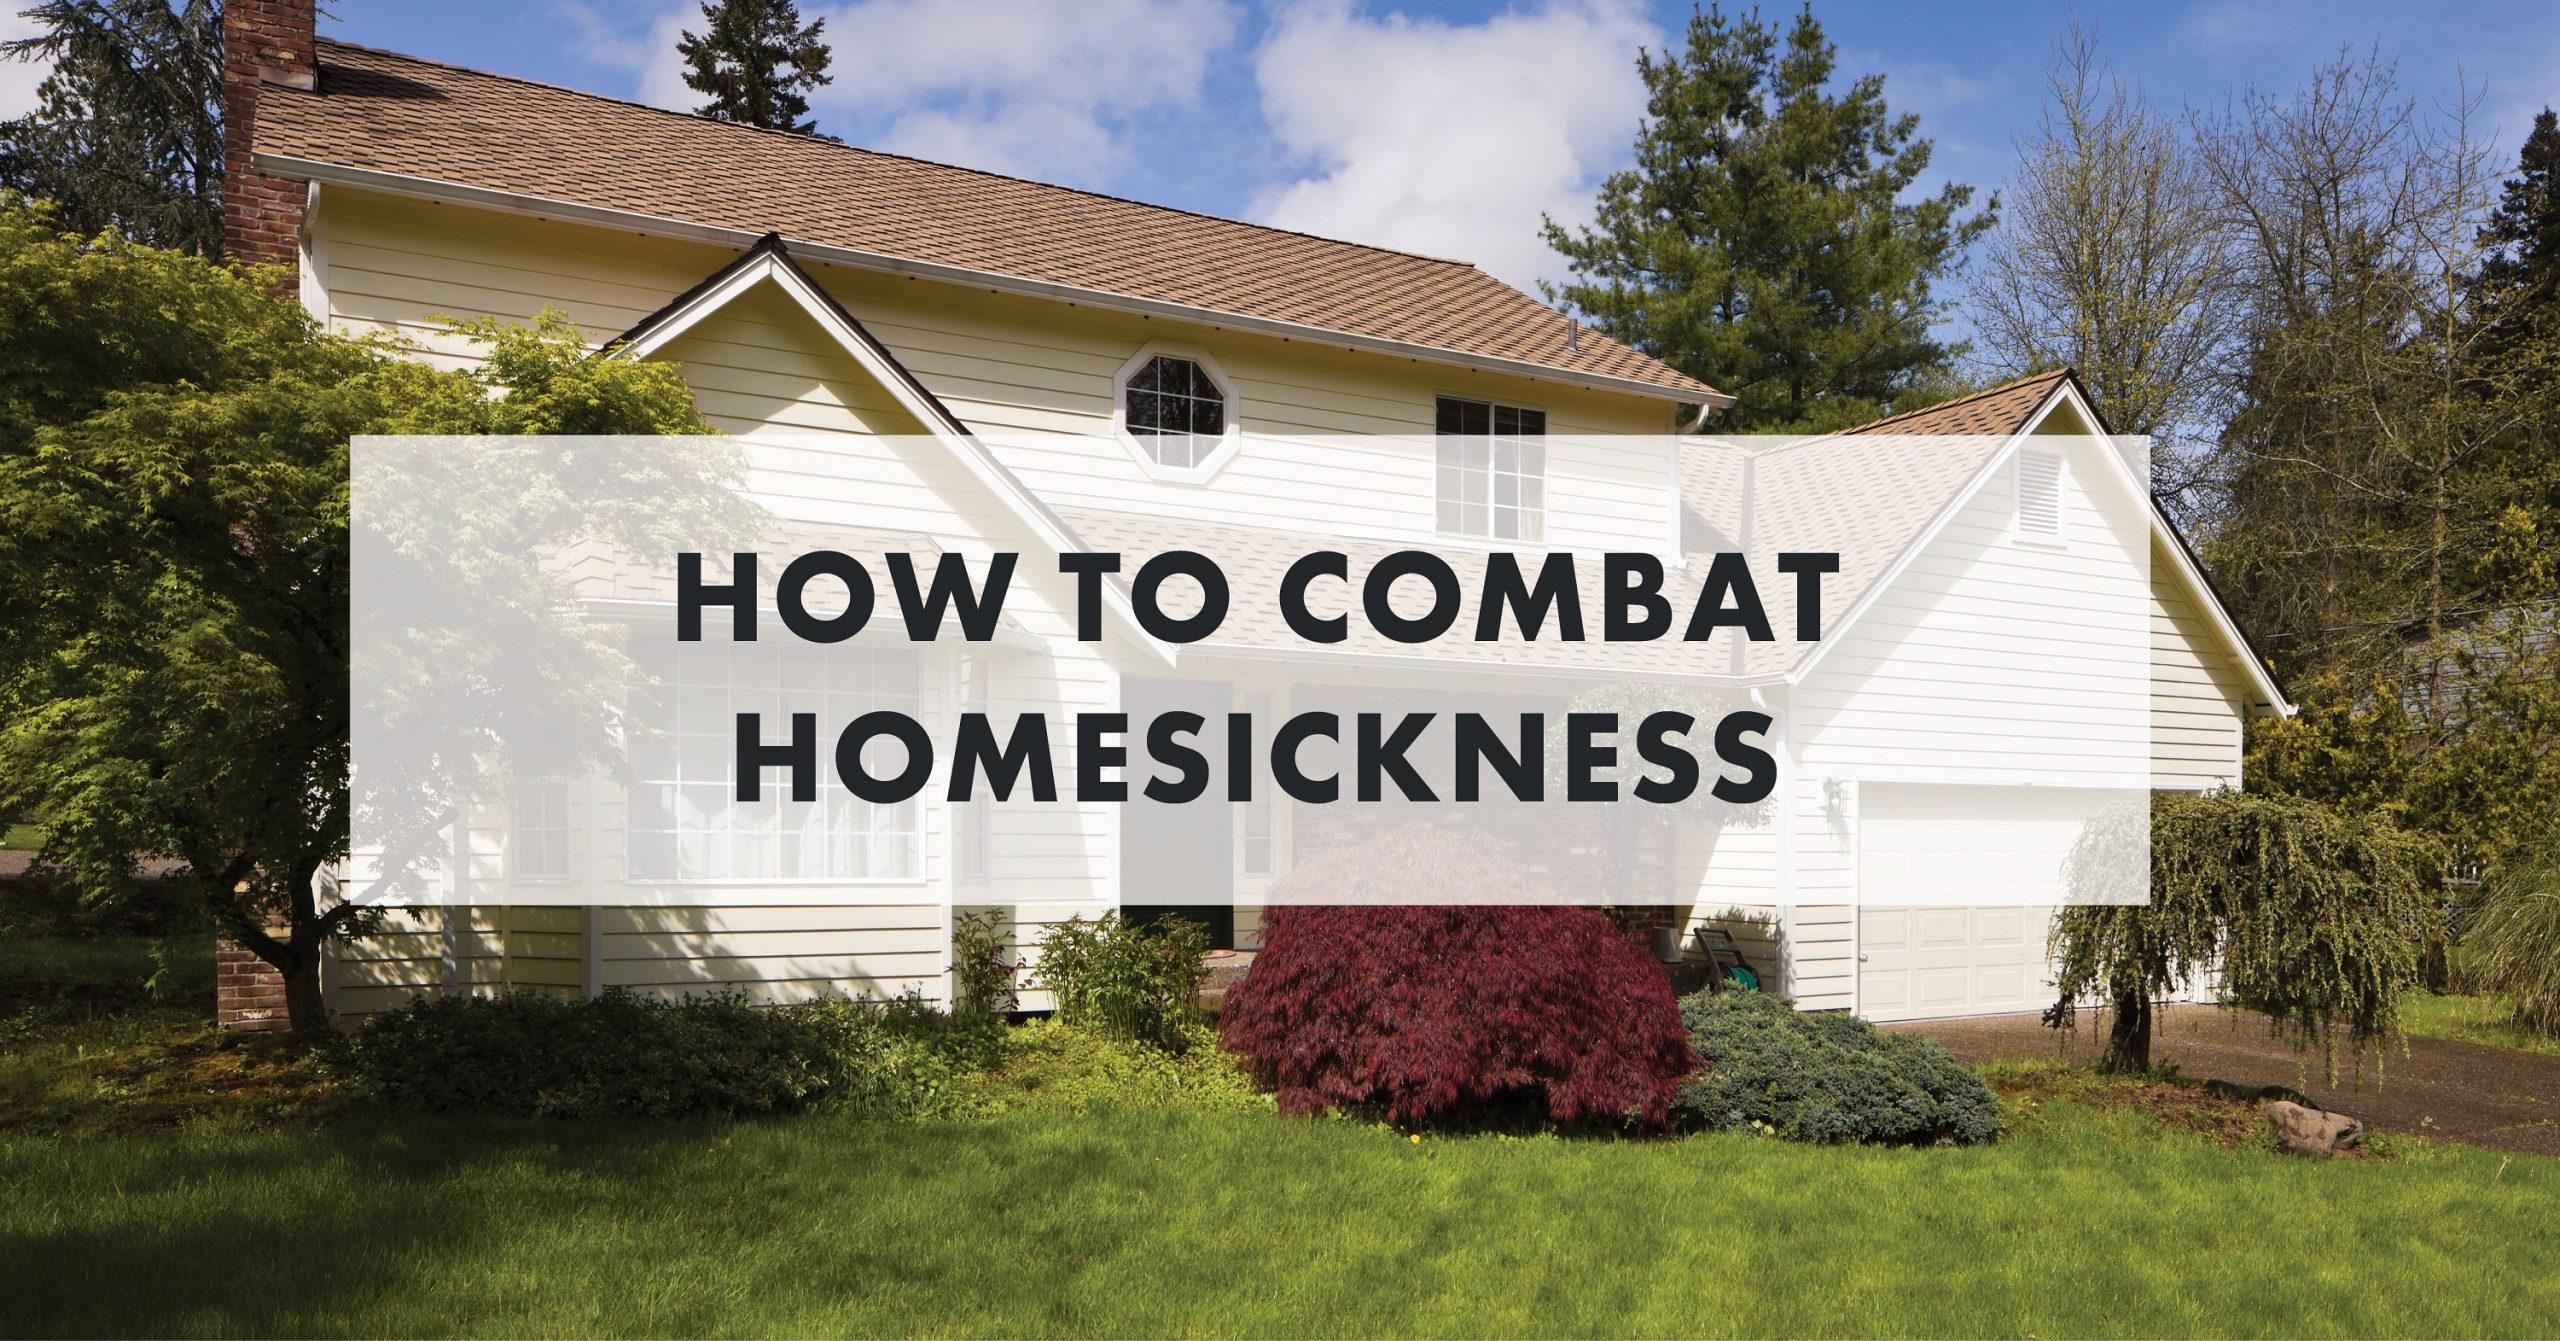 How to Combat Homesickness - Blog Image